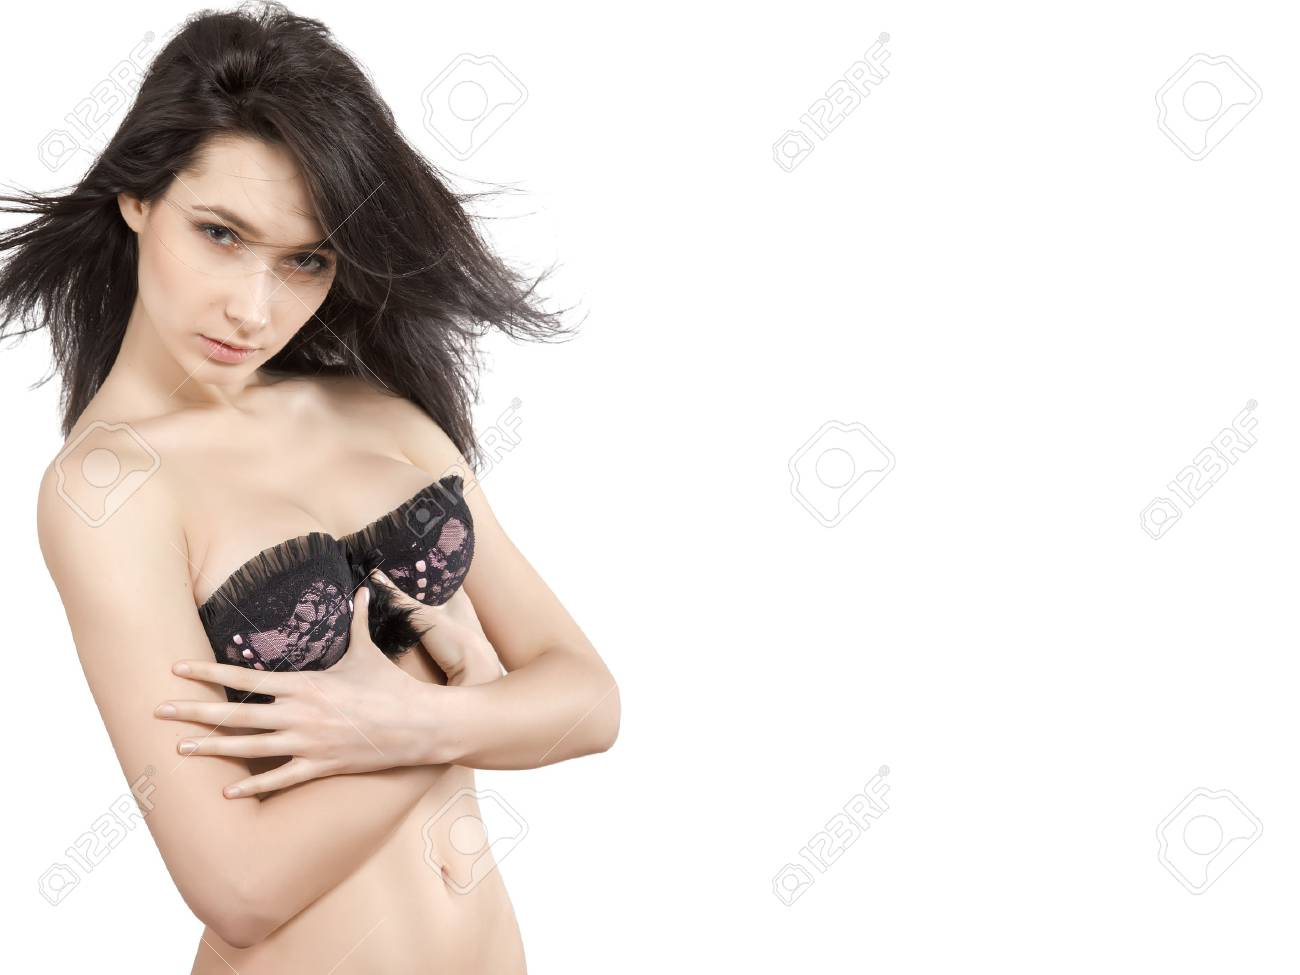 Nepali nude girls